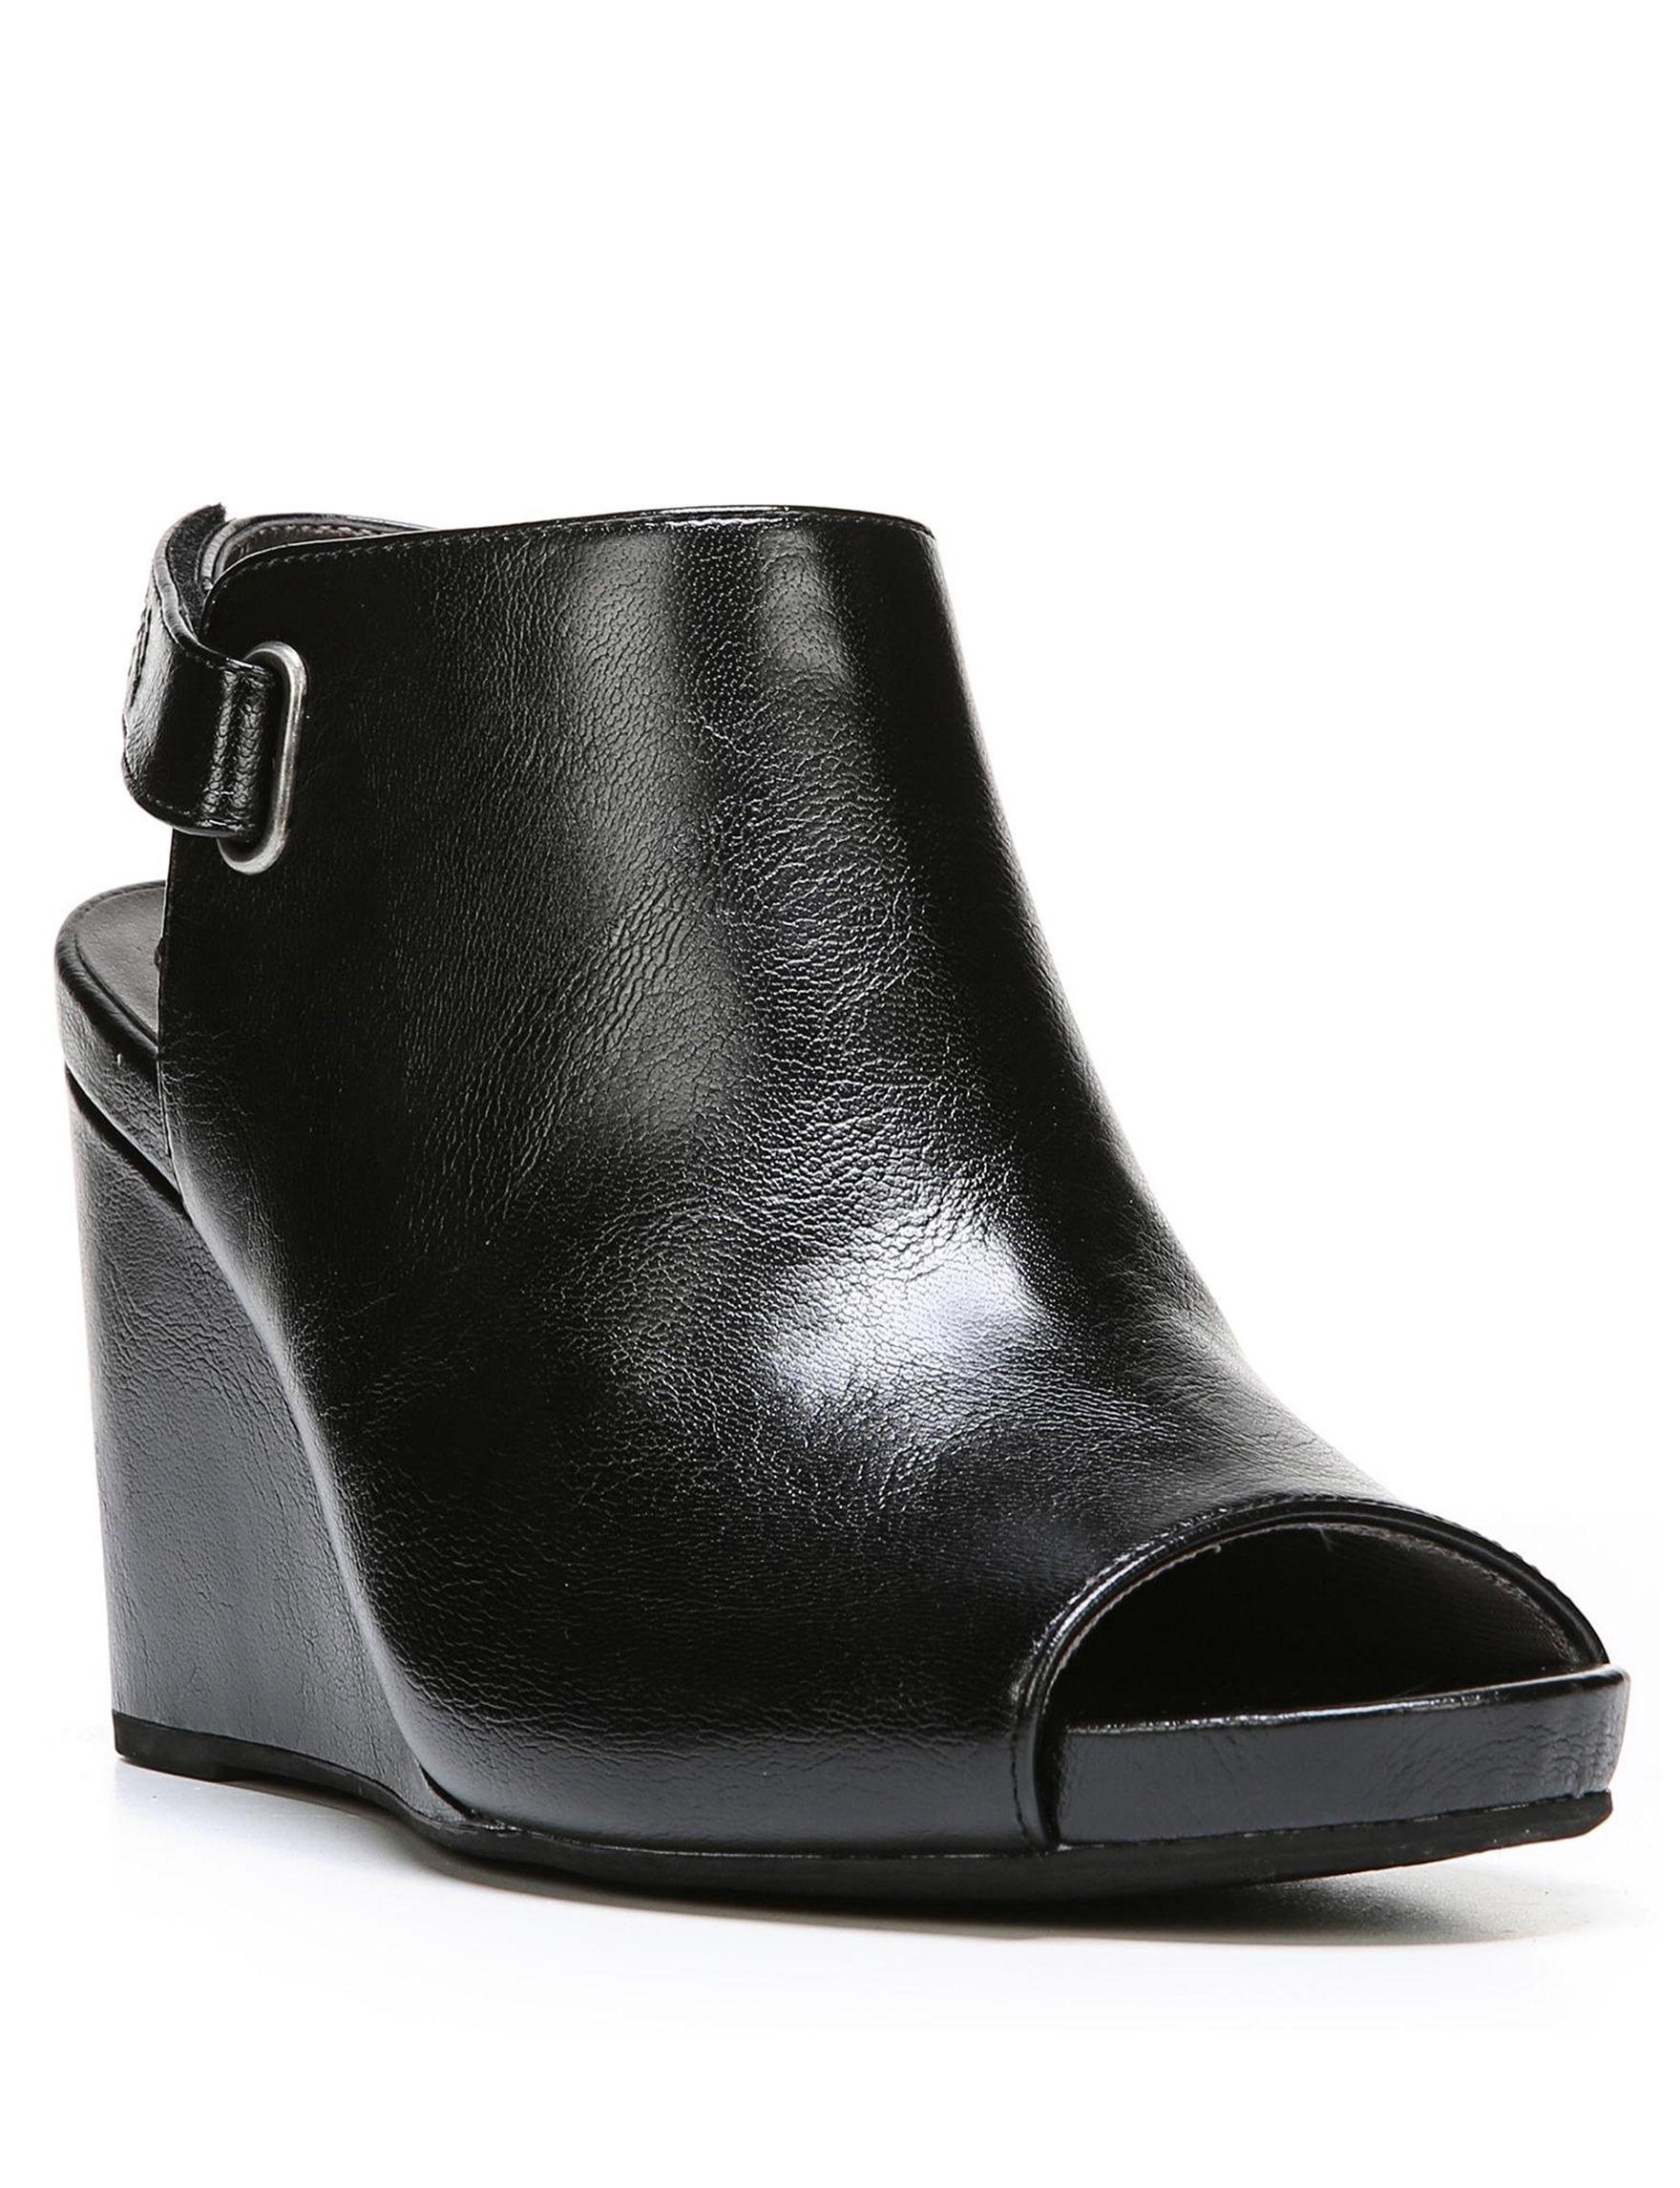 Lifestride Black Peep Toe Wedge Sandals